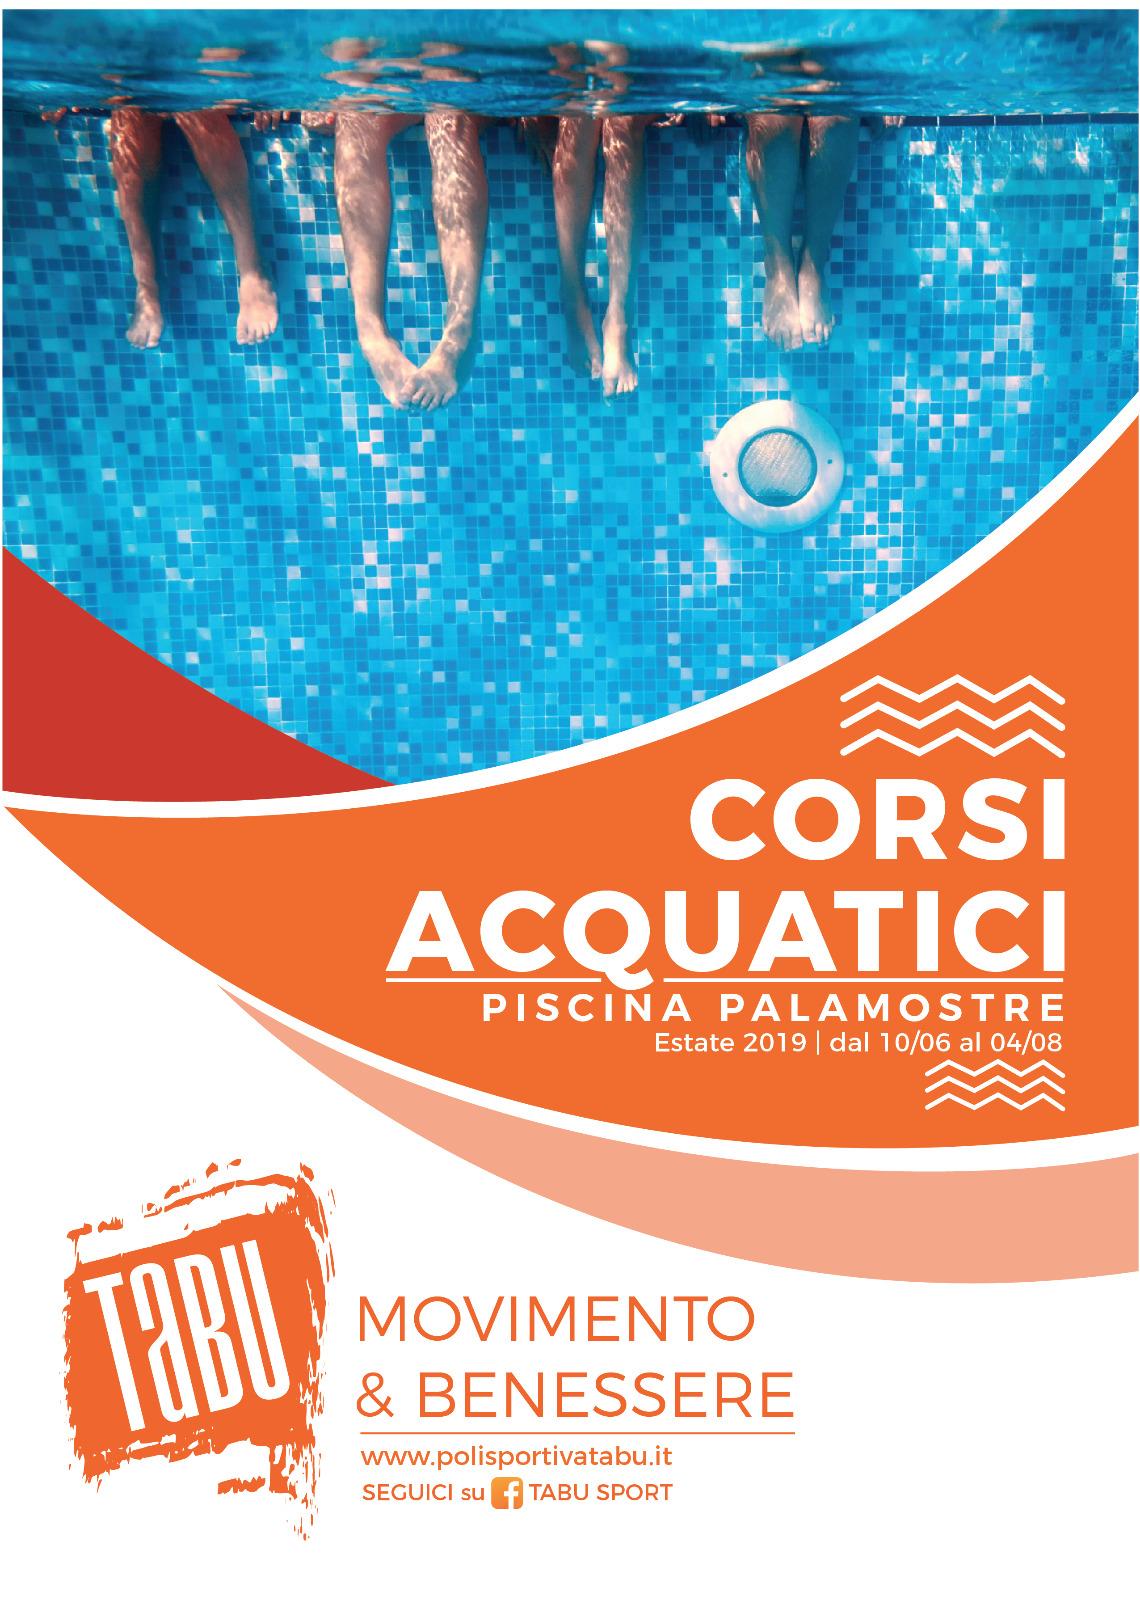 Corsi acquatici a Udine estate 2019